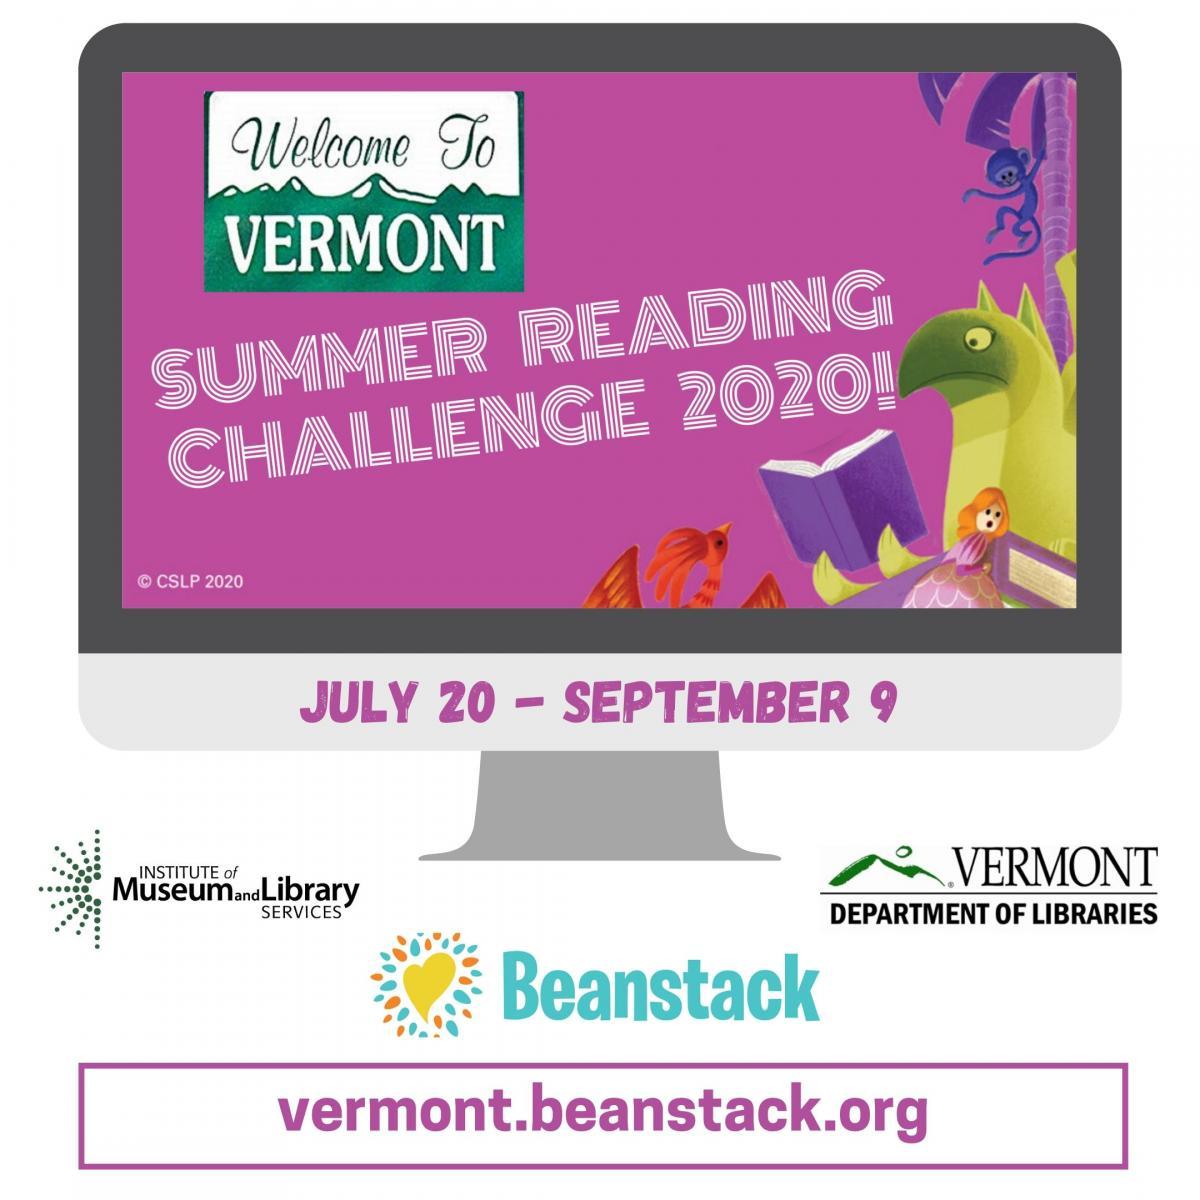 vermont.beanstack.org_